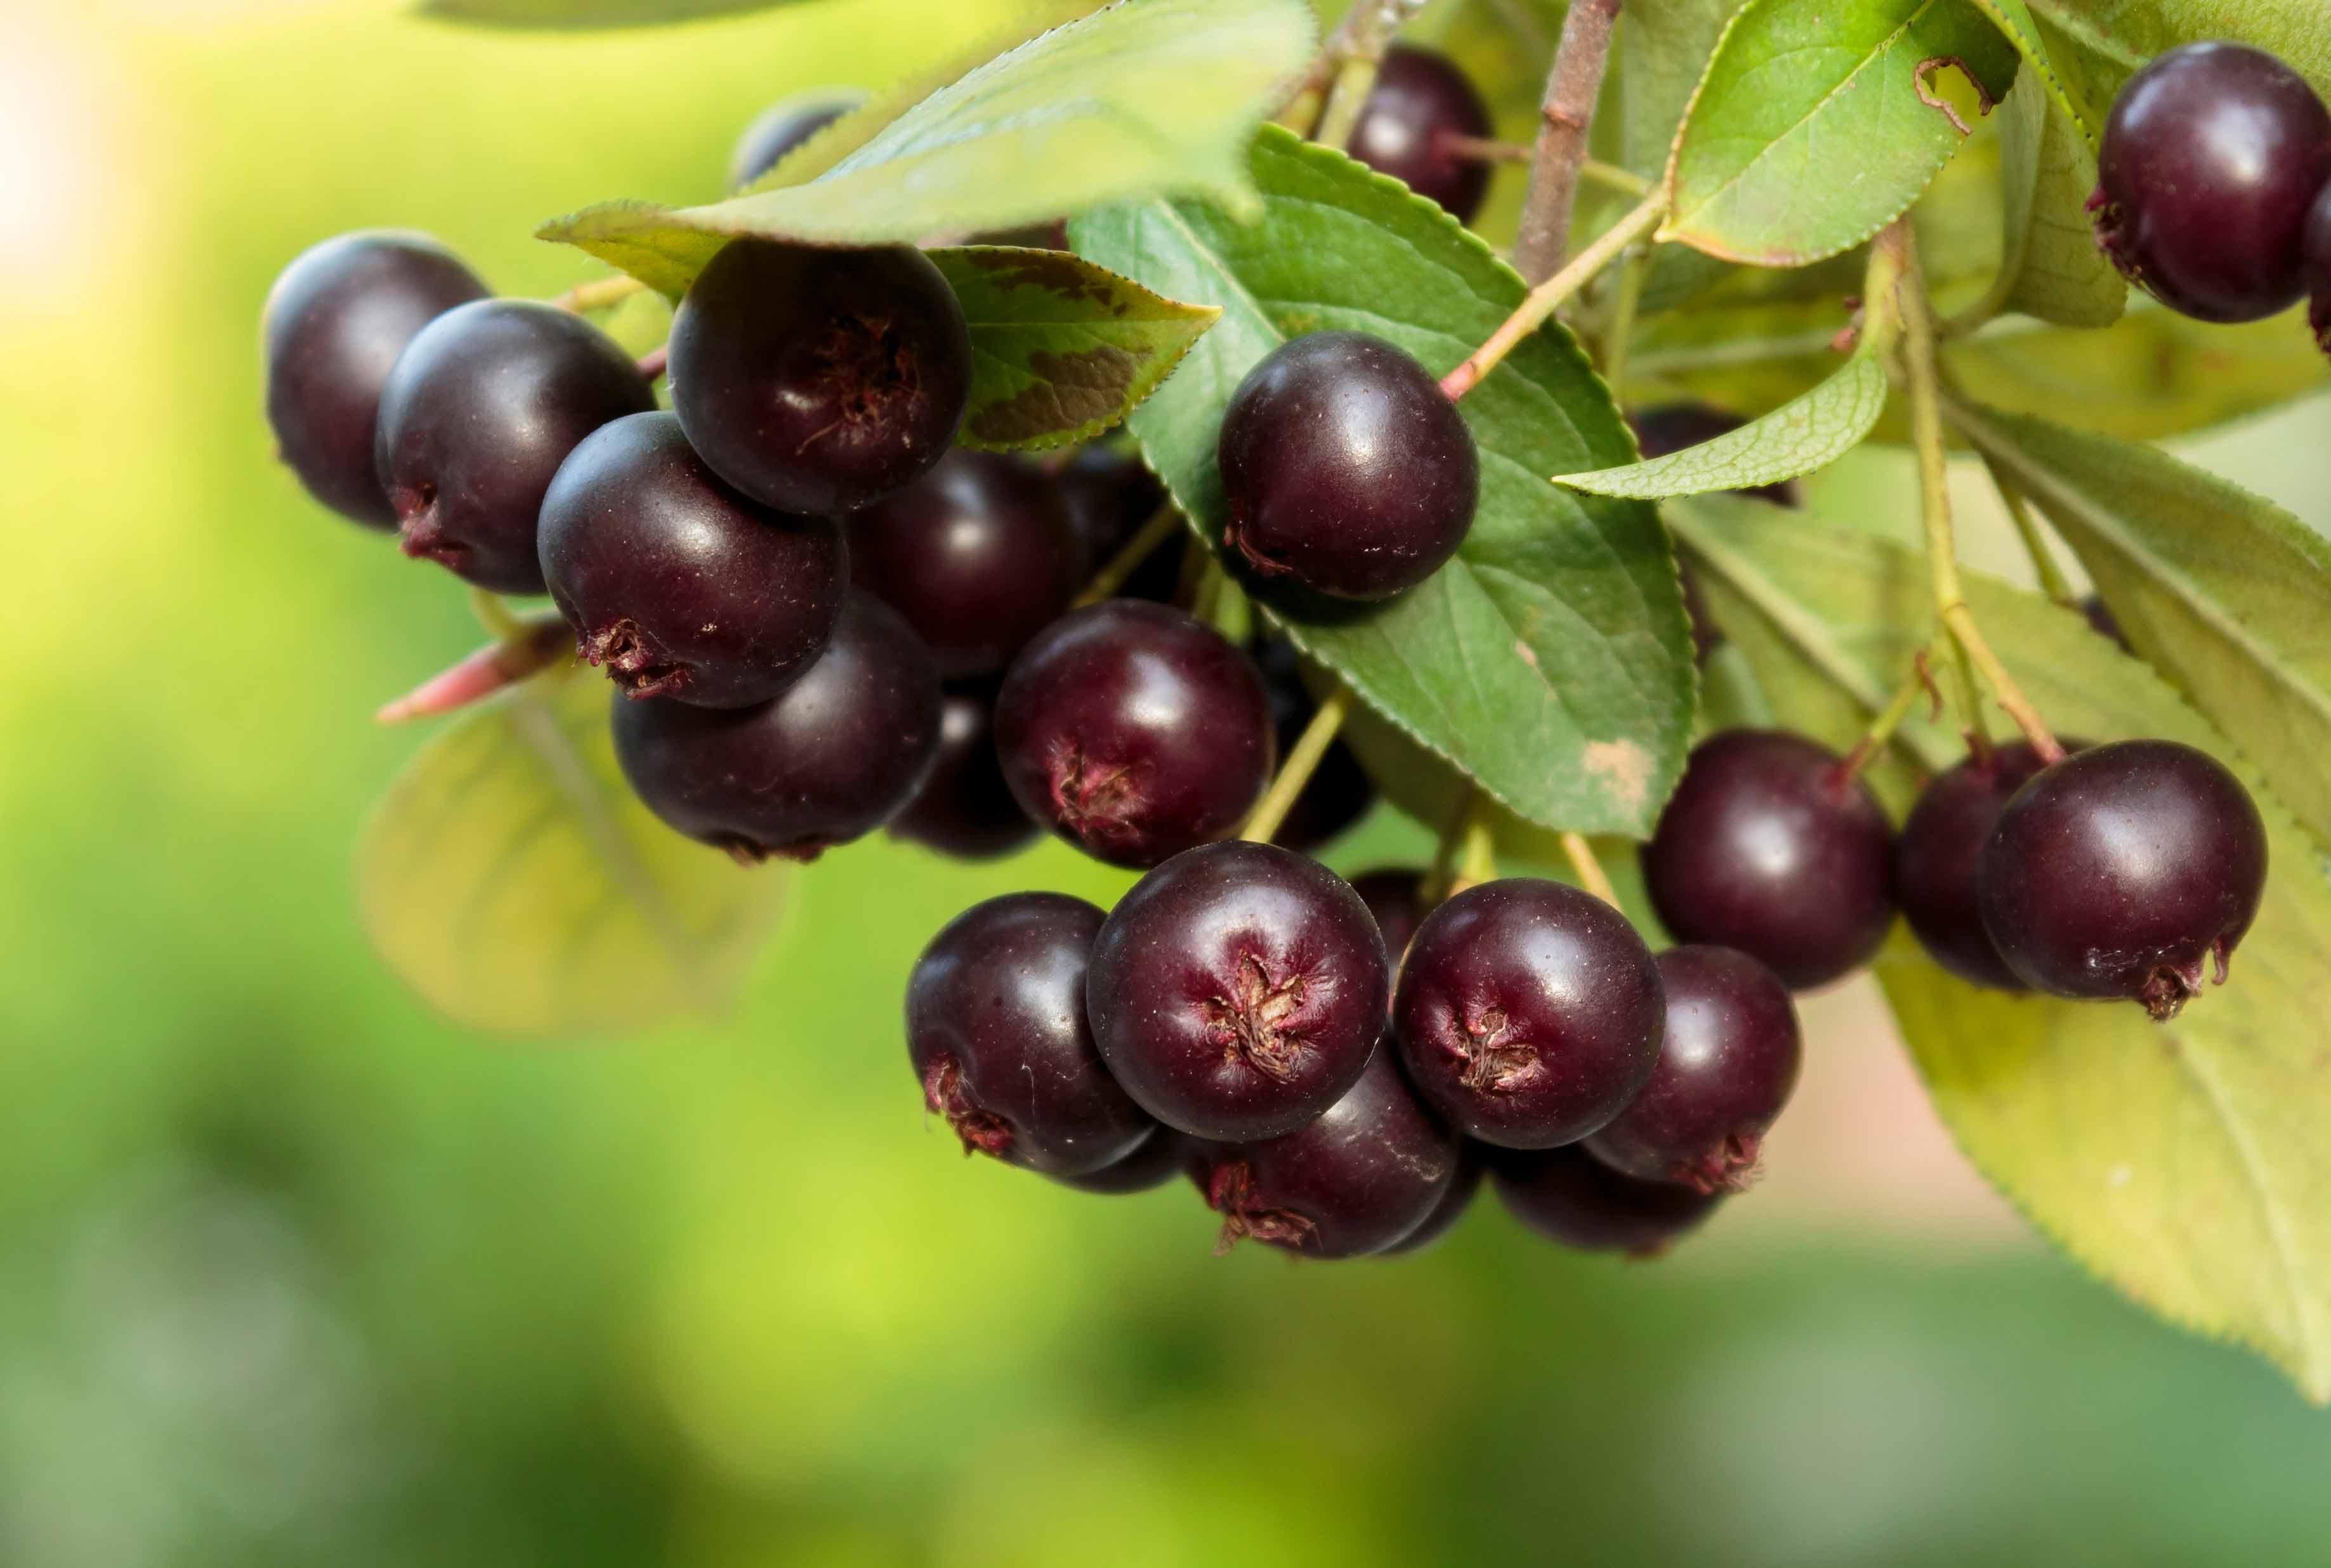 Growing Berries on the Suburban Farm